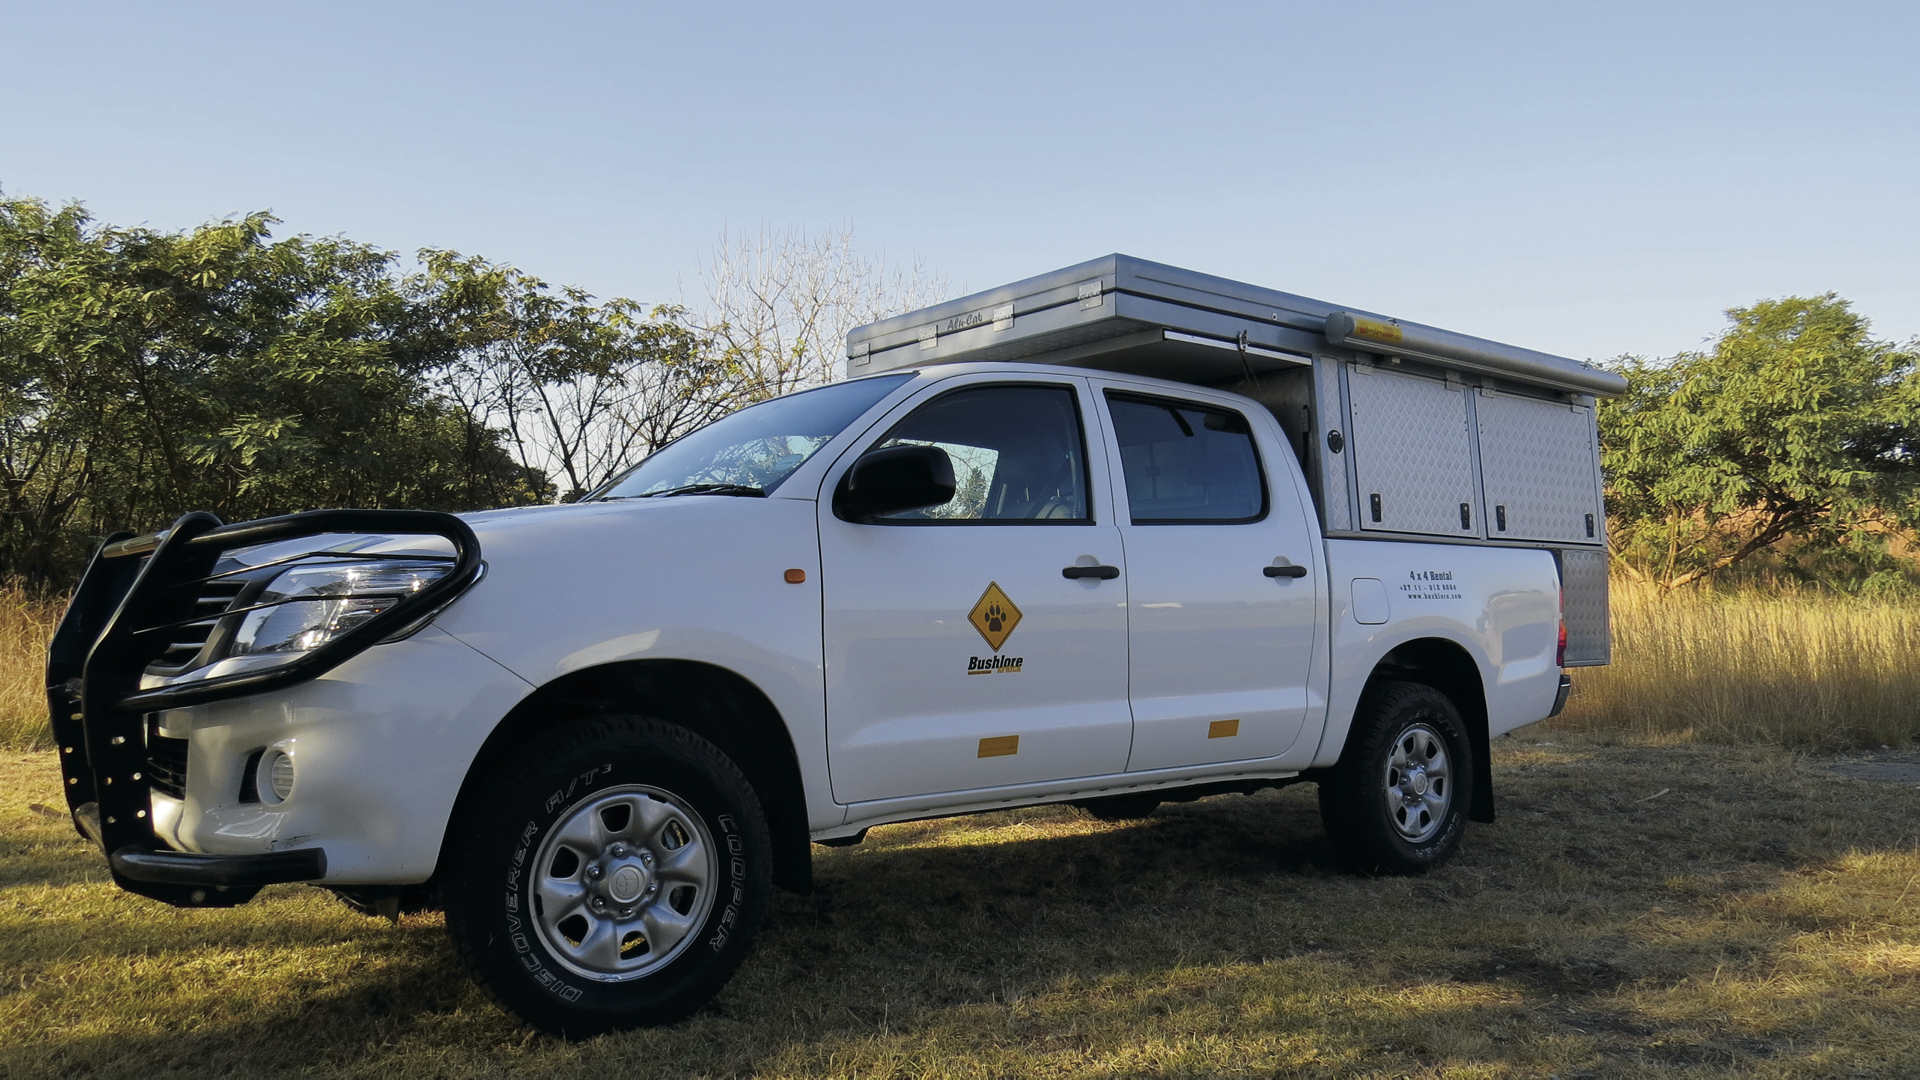 Toyota Hilux Bushcamper